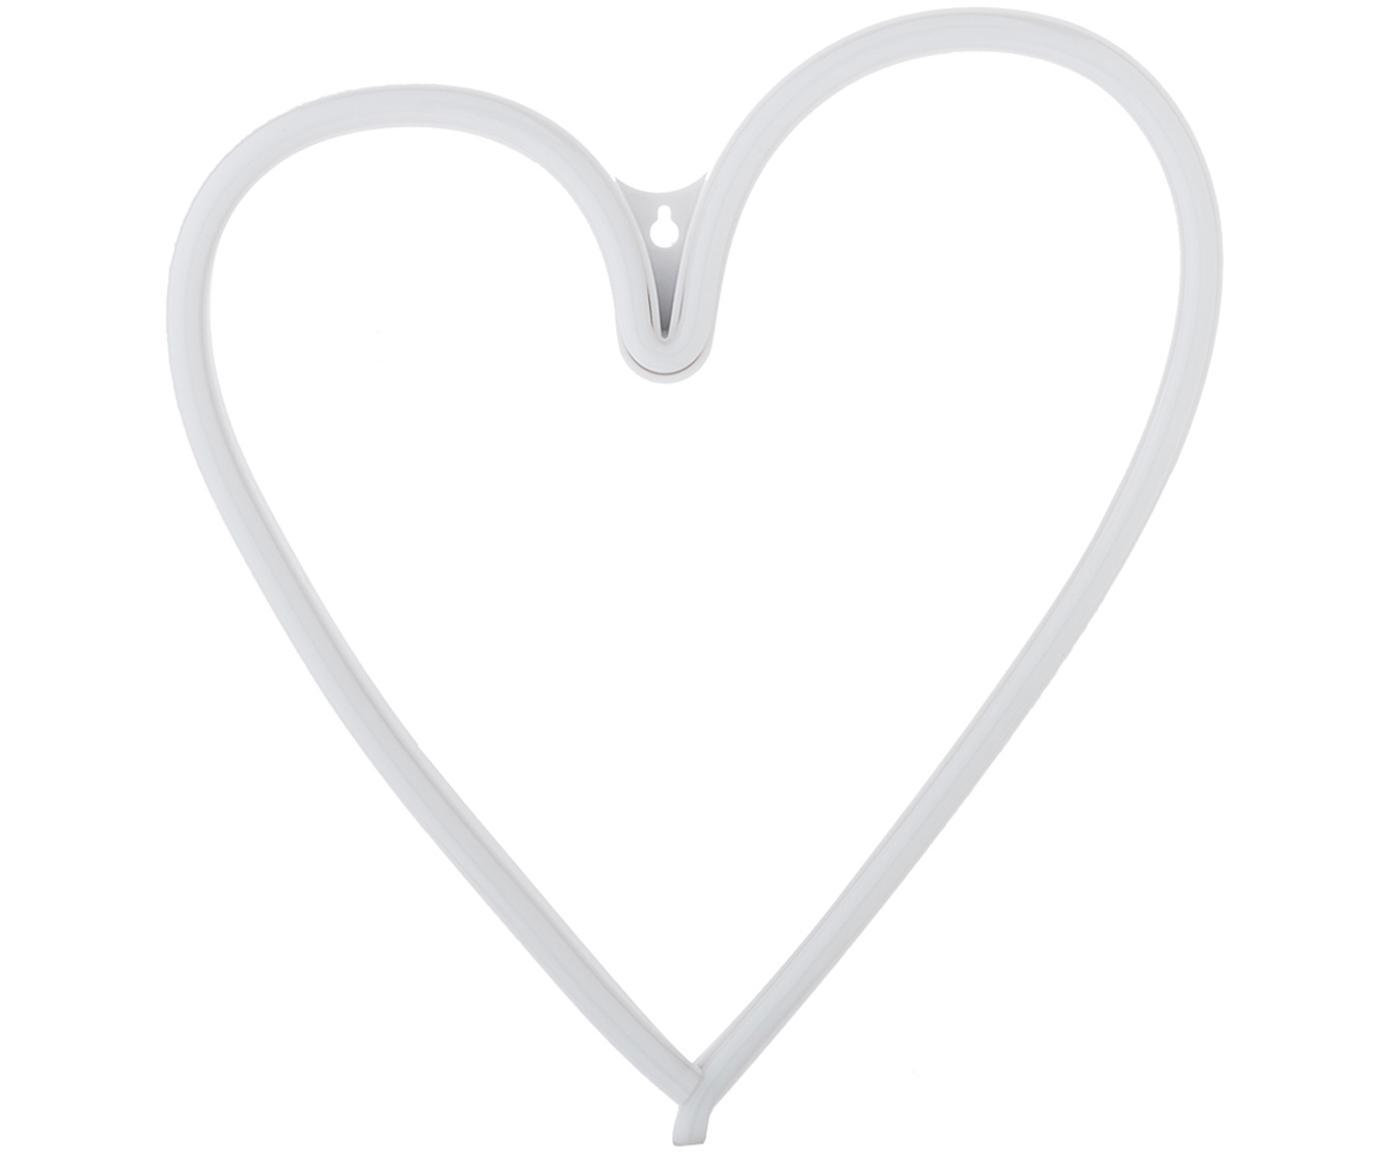 LED wandlamp Heart, Lamp: BPA-vrij PVC, Lichtkleur: geel. Wanneer uitgeschakeld, wordt het LED lampje wit, 30 x 29 cm